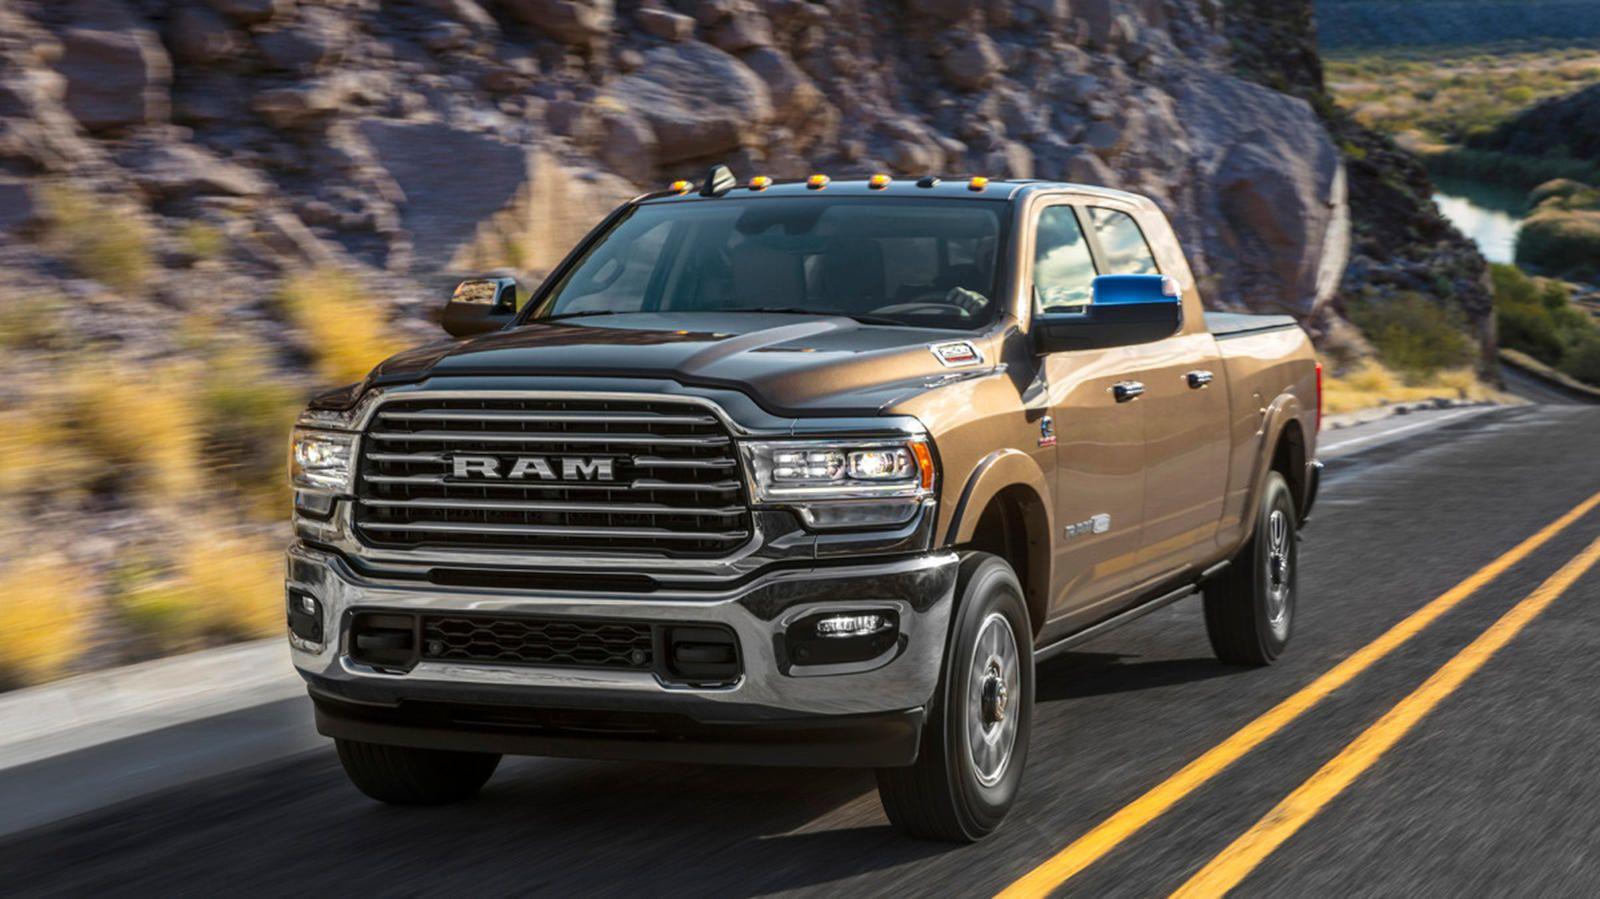 Most Brutal Pickup Trucks On The Planet Big Muscle For Doing Big Truck Things In 2020 Ram 2500 Mega Cab Dodge Mega Cab Dodge Ram